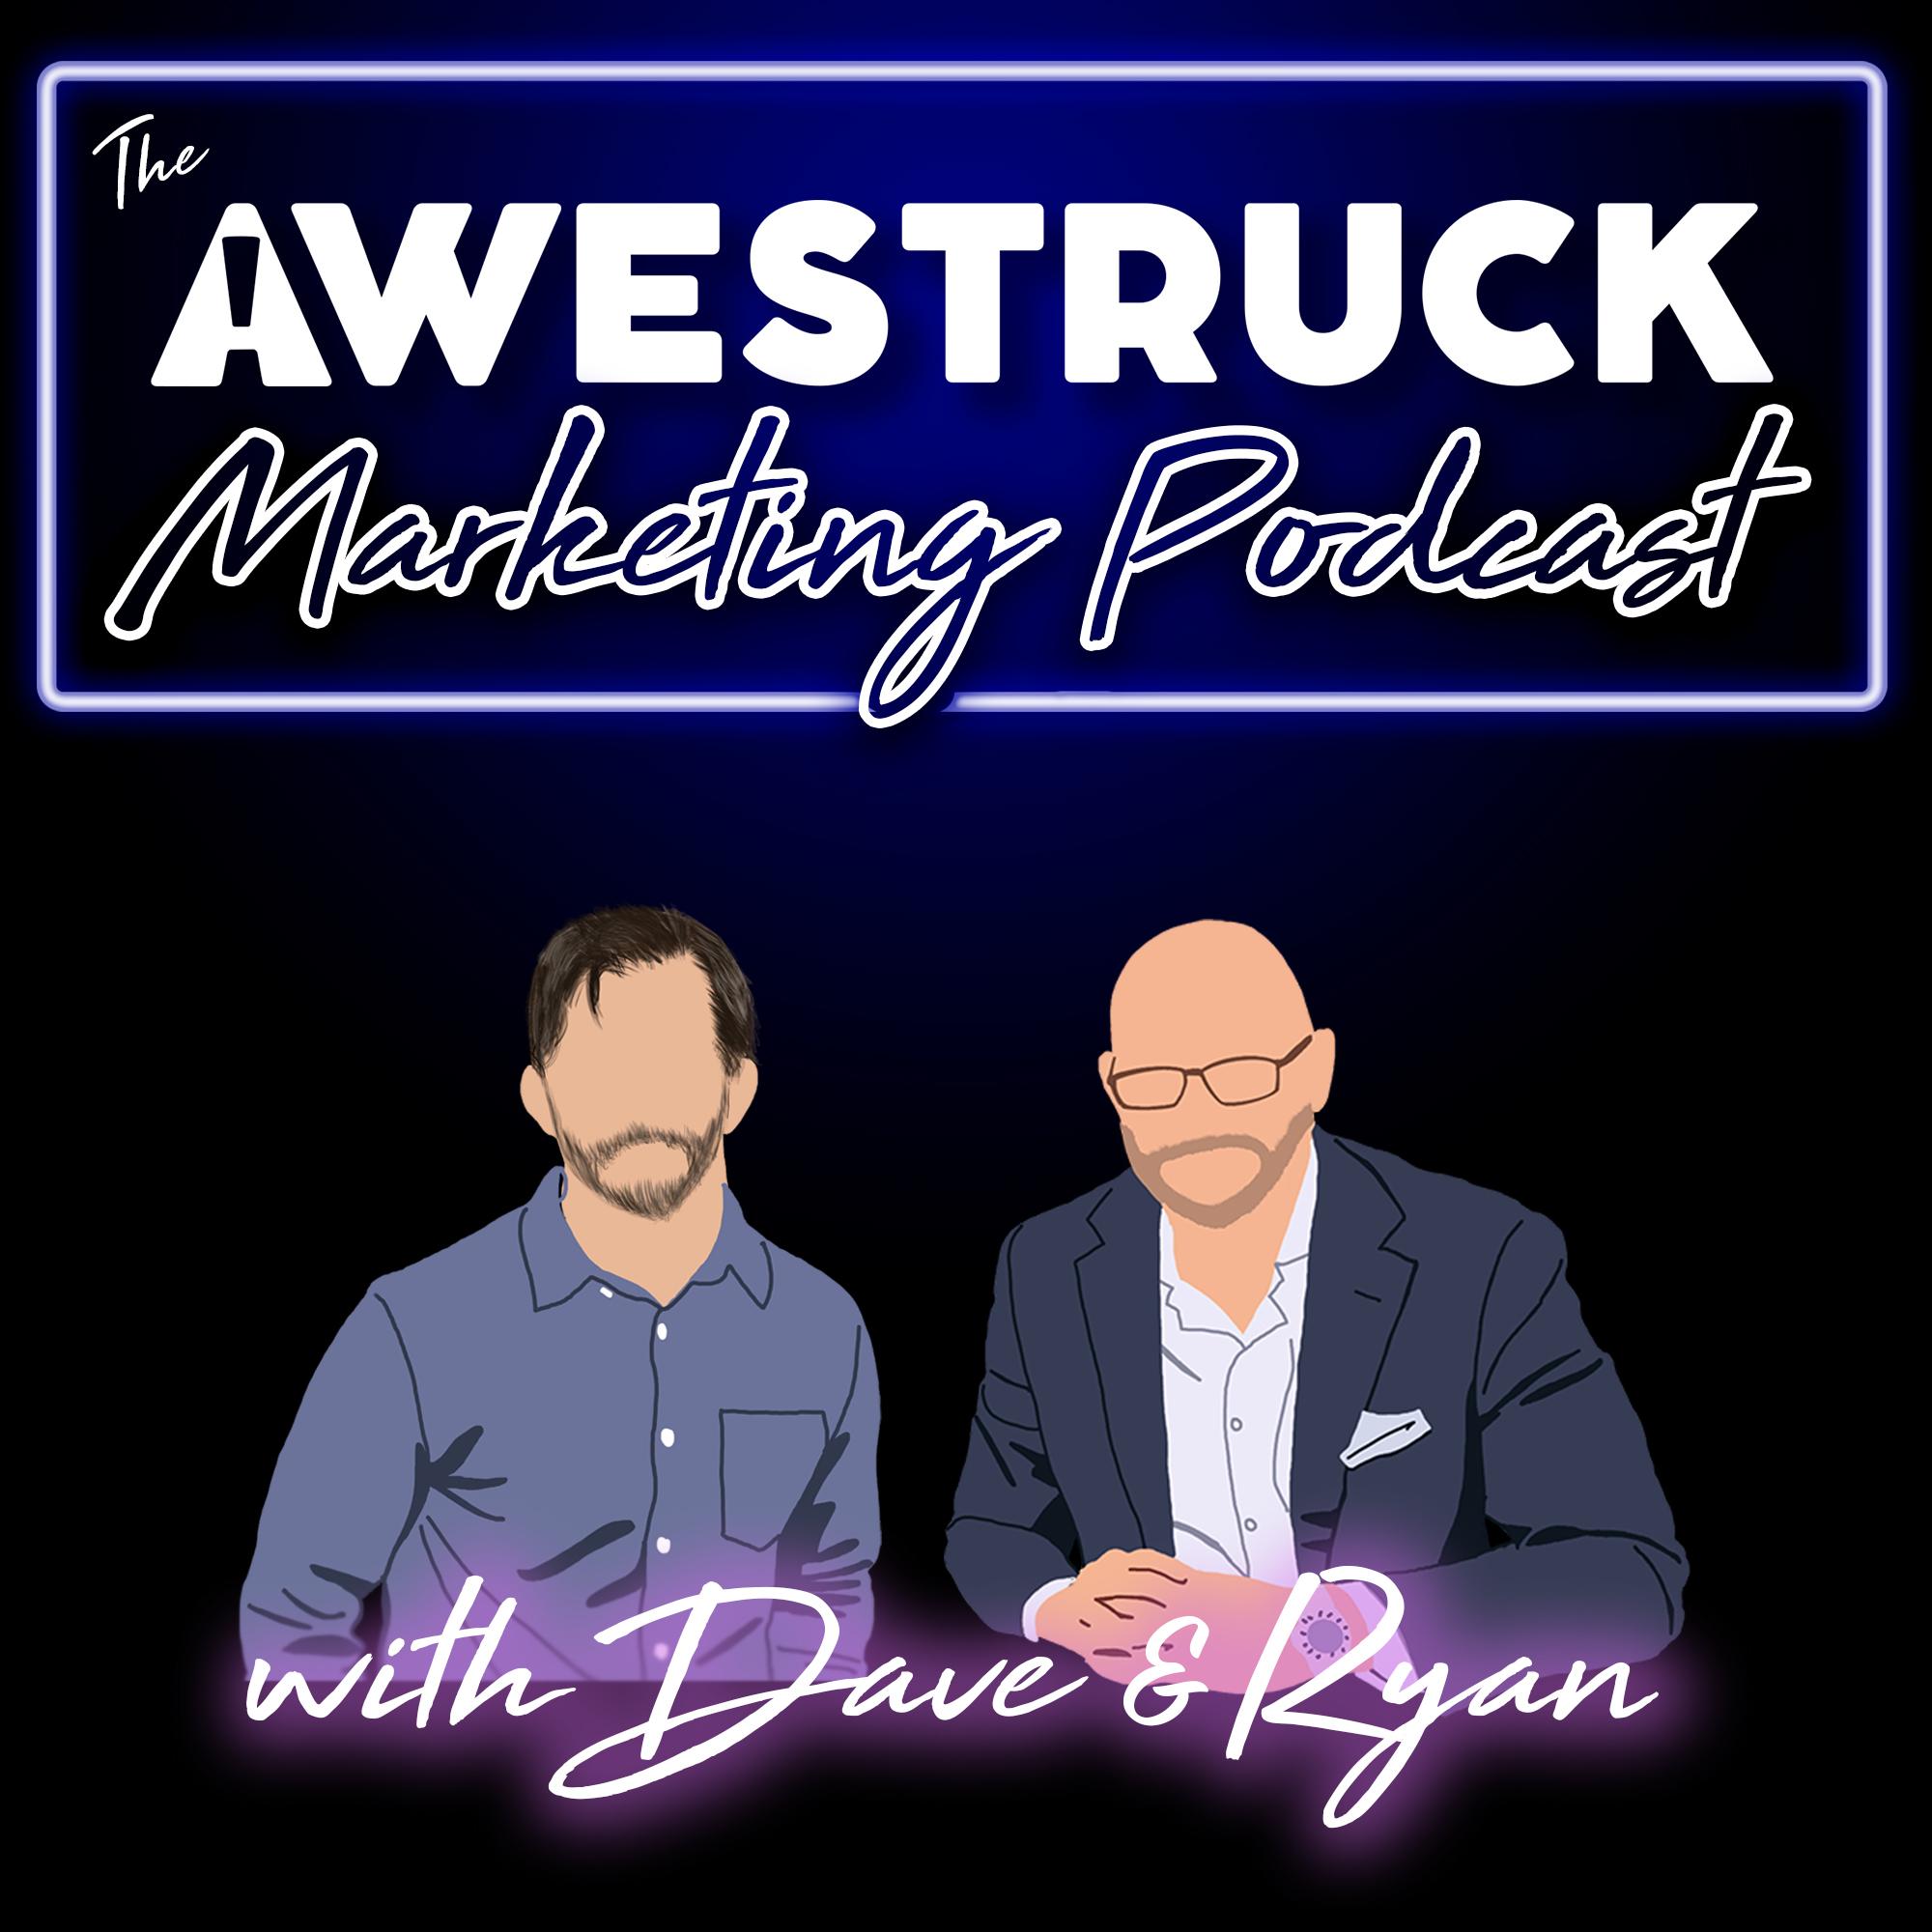 The Awestruck Marketing Podcast show art